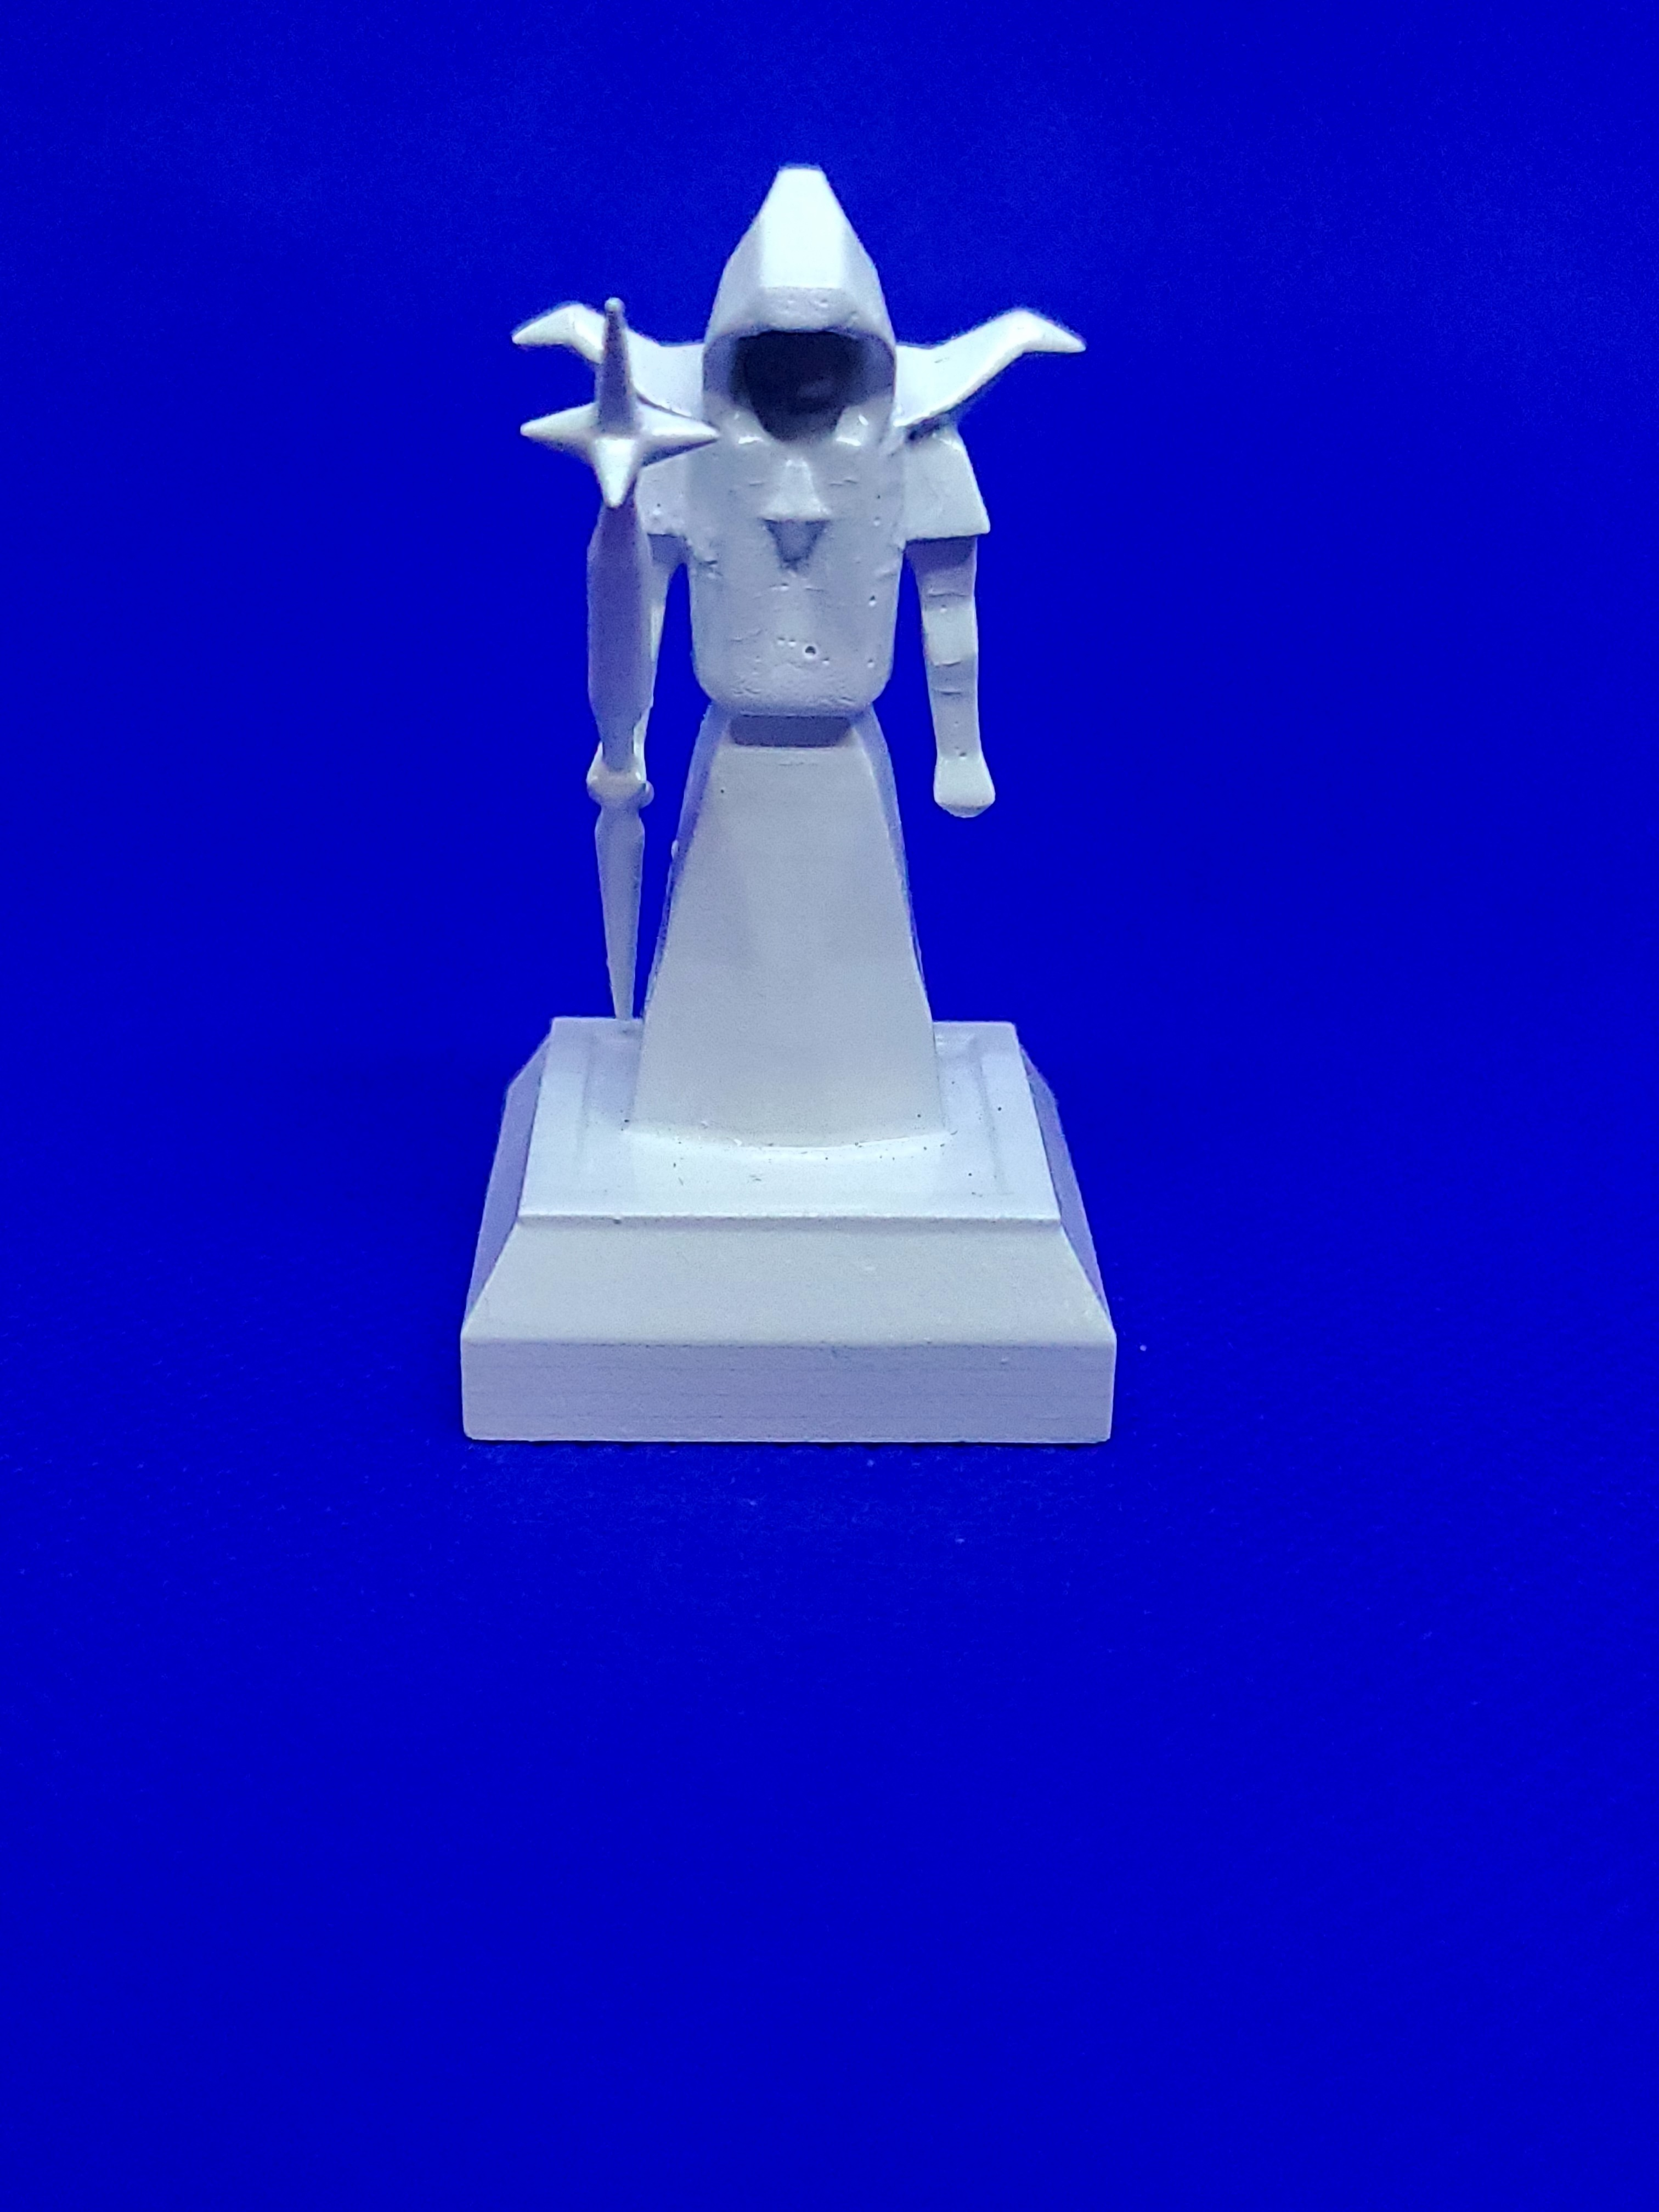 20201015_182650 - Copy.jpg Download STL file OSRS Chess Set Old School Runescape Mini Figures  • Model to 3D print, Wychu